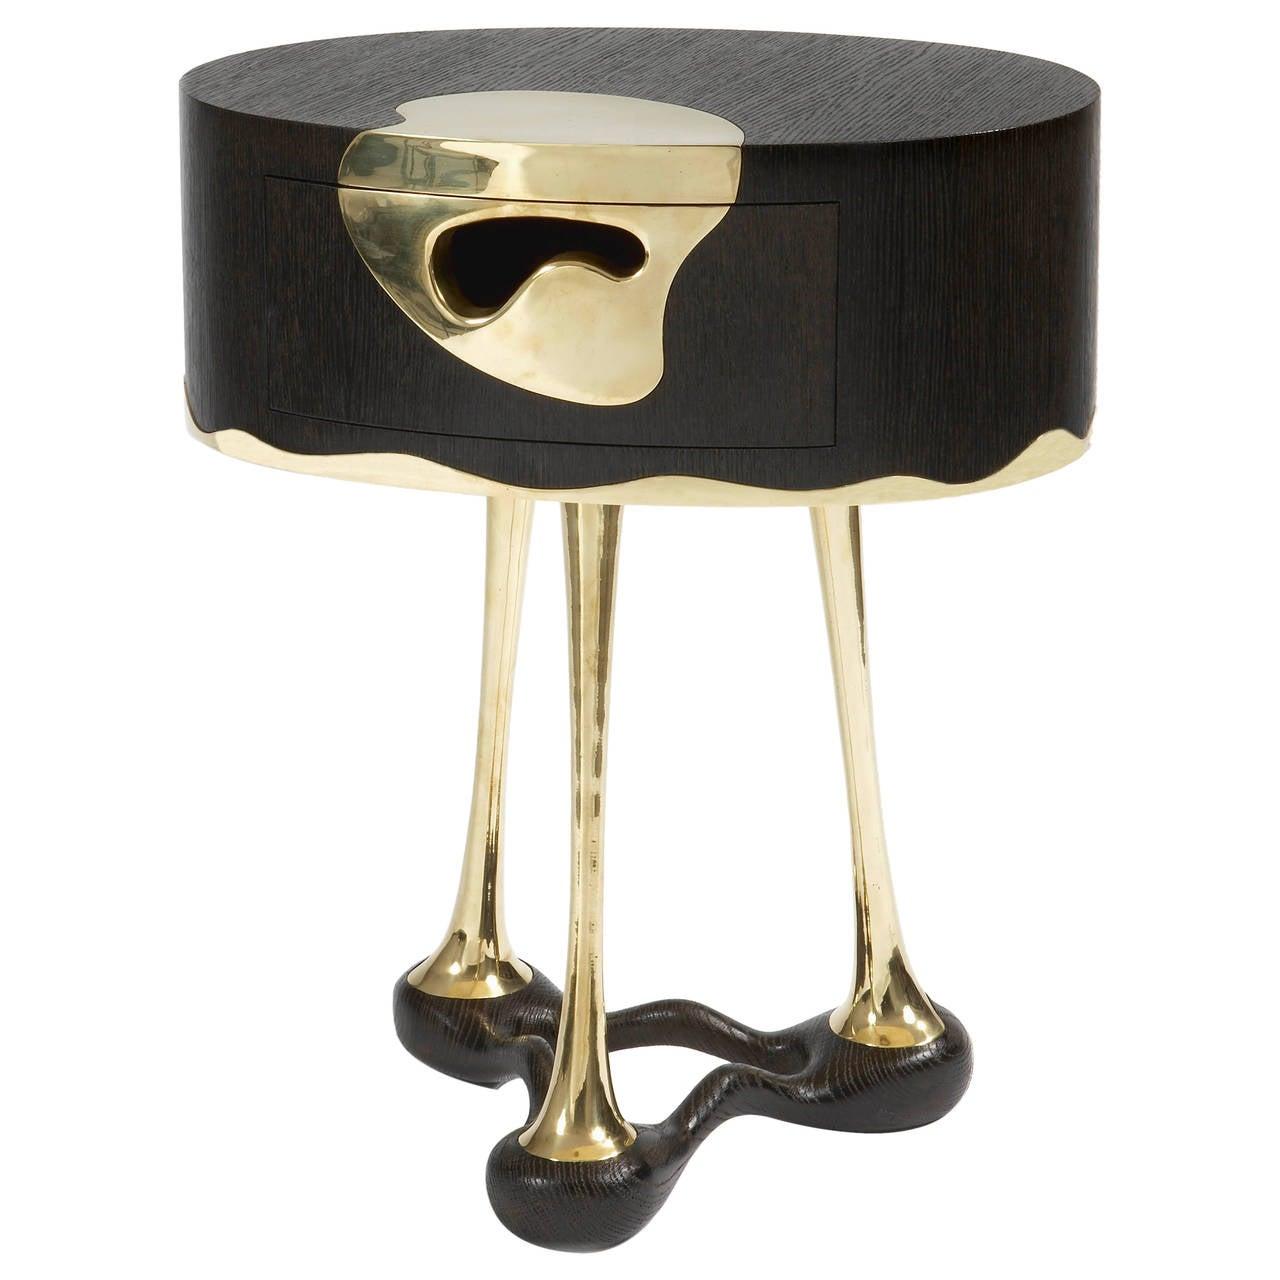 UFO Side Table by Mattia Bonetti. In stock.